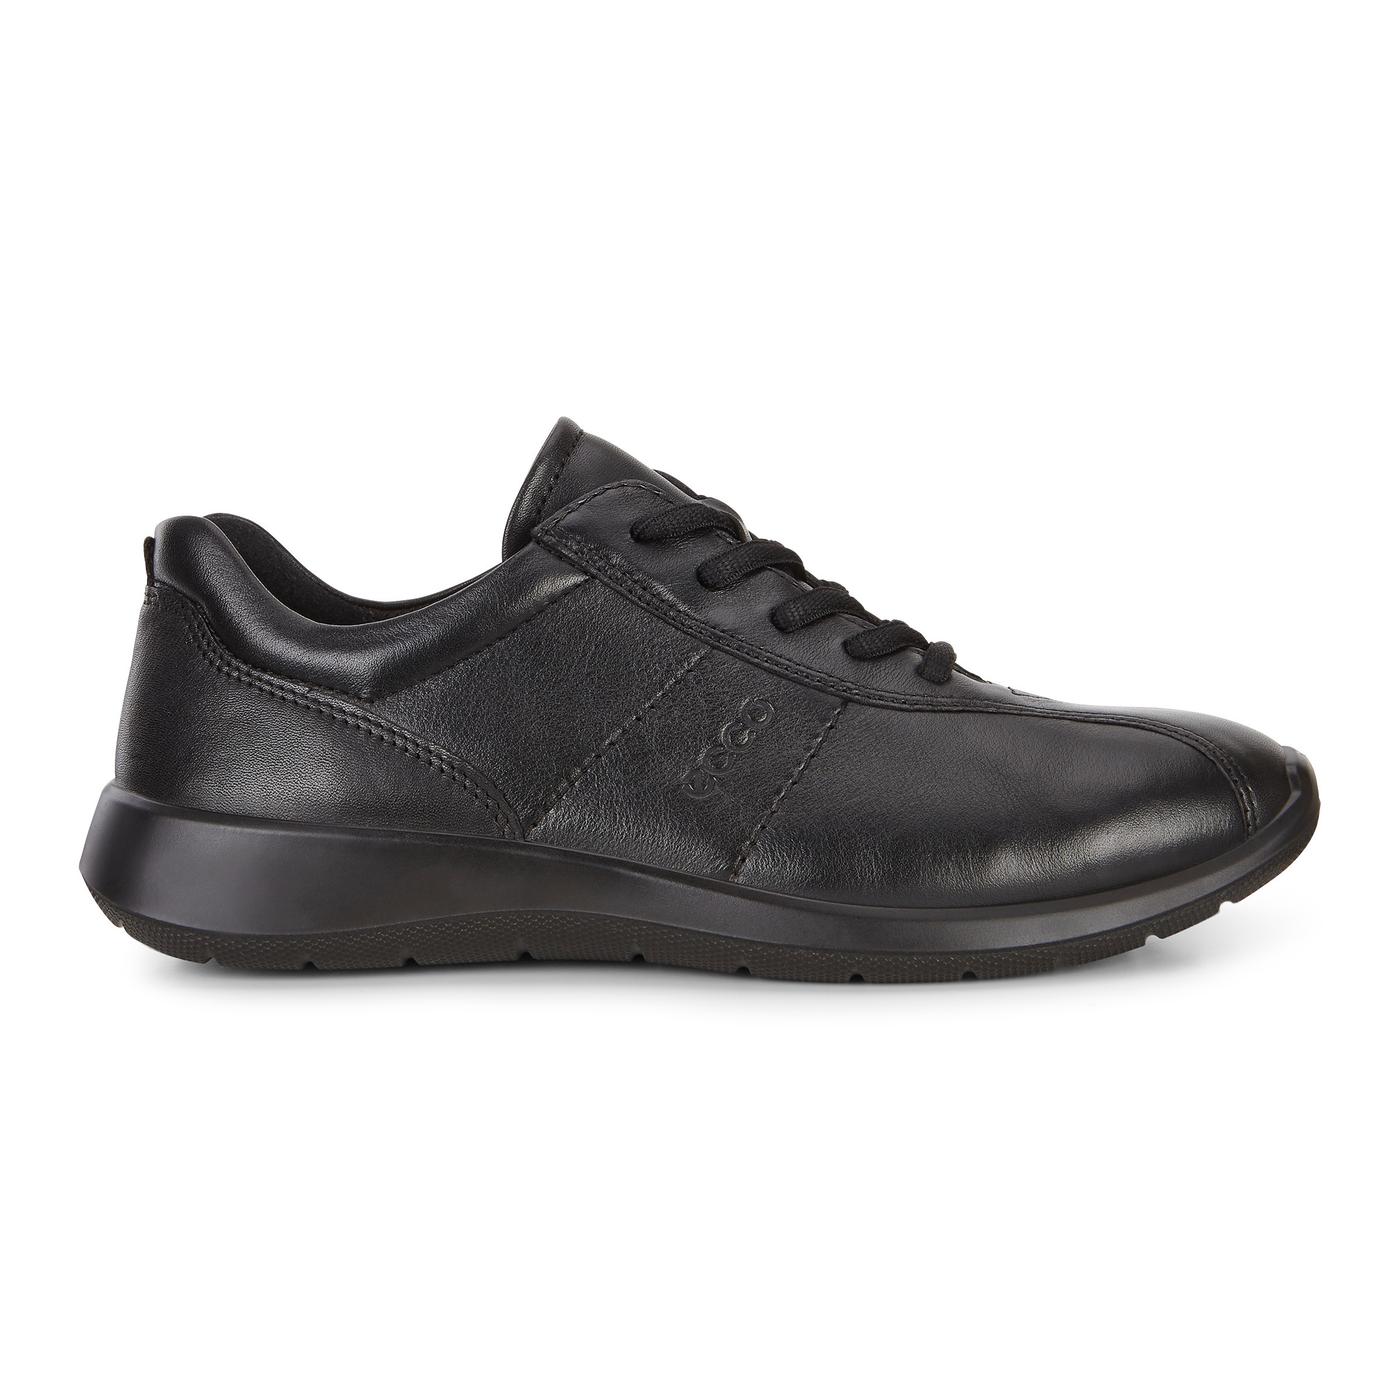 ECCO SOFT 5 Shoe